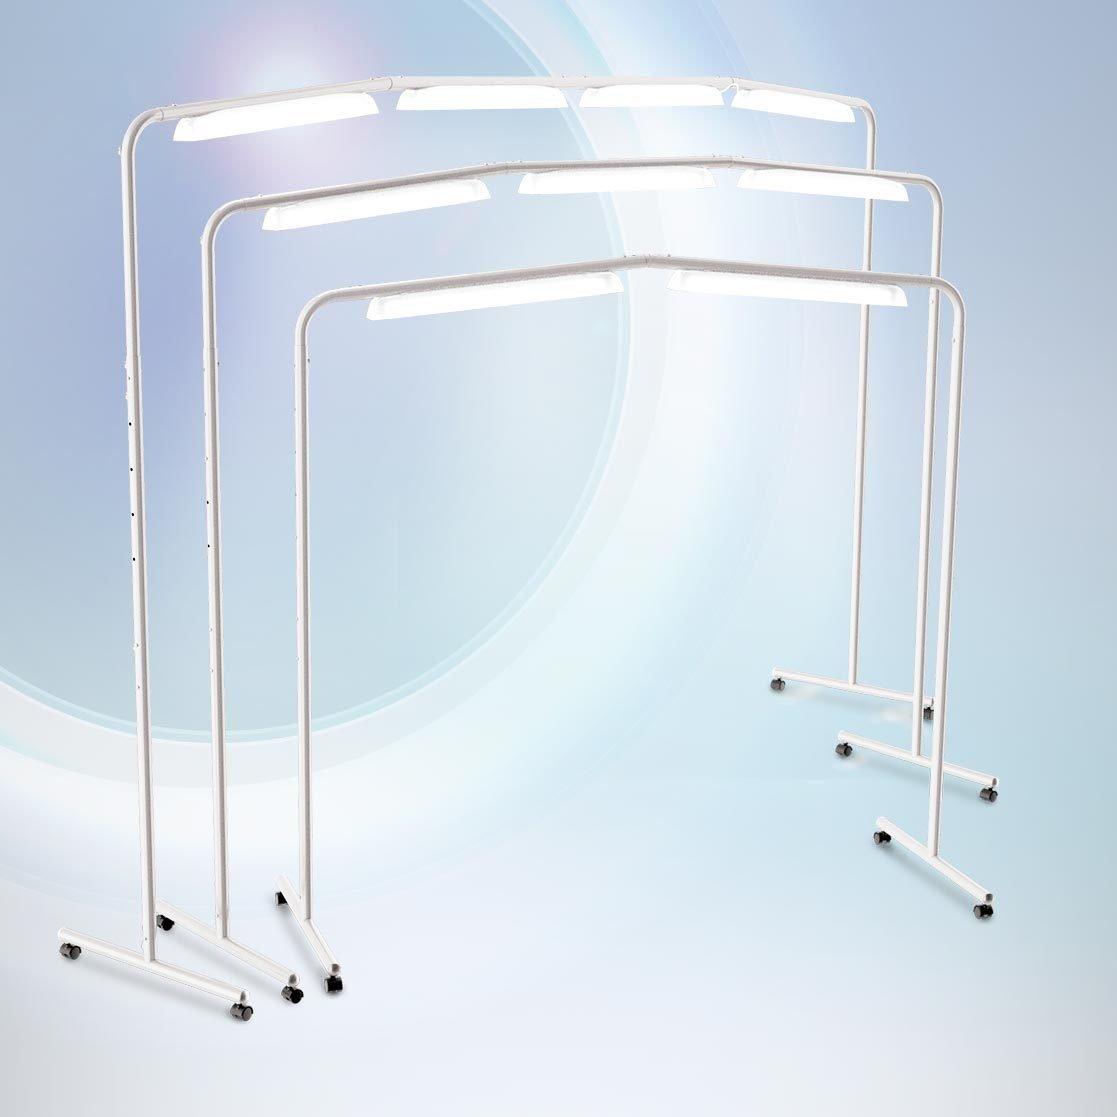 Luminess Light Bar, 5'